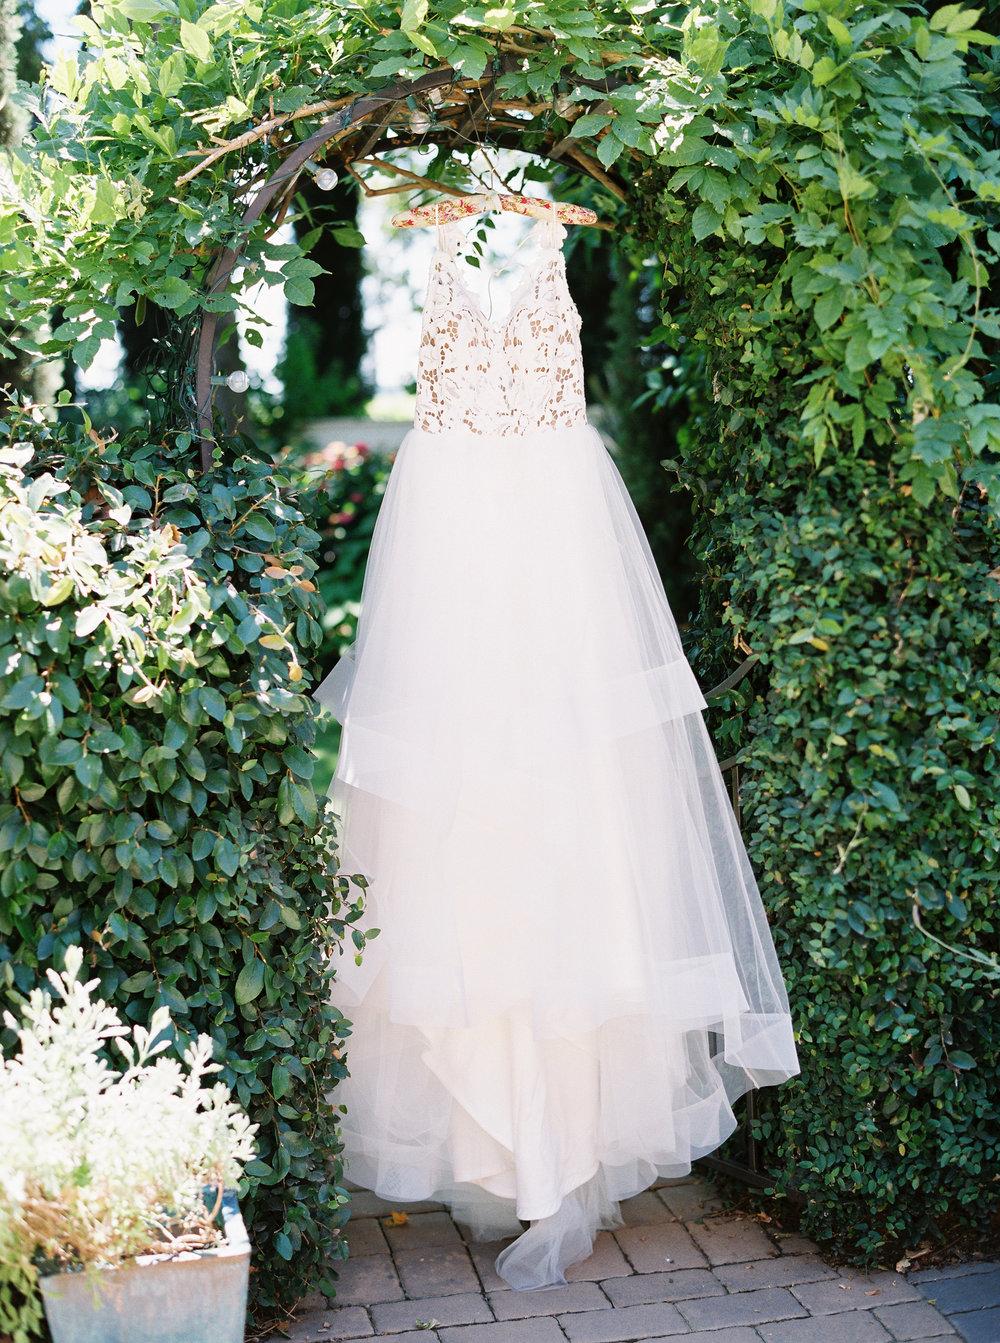 Durst-winery-wedding-in-lodi-calfornia-78.jpg